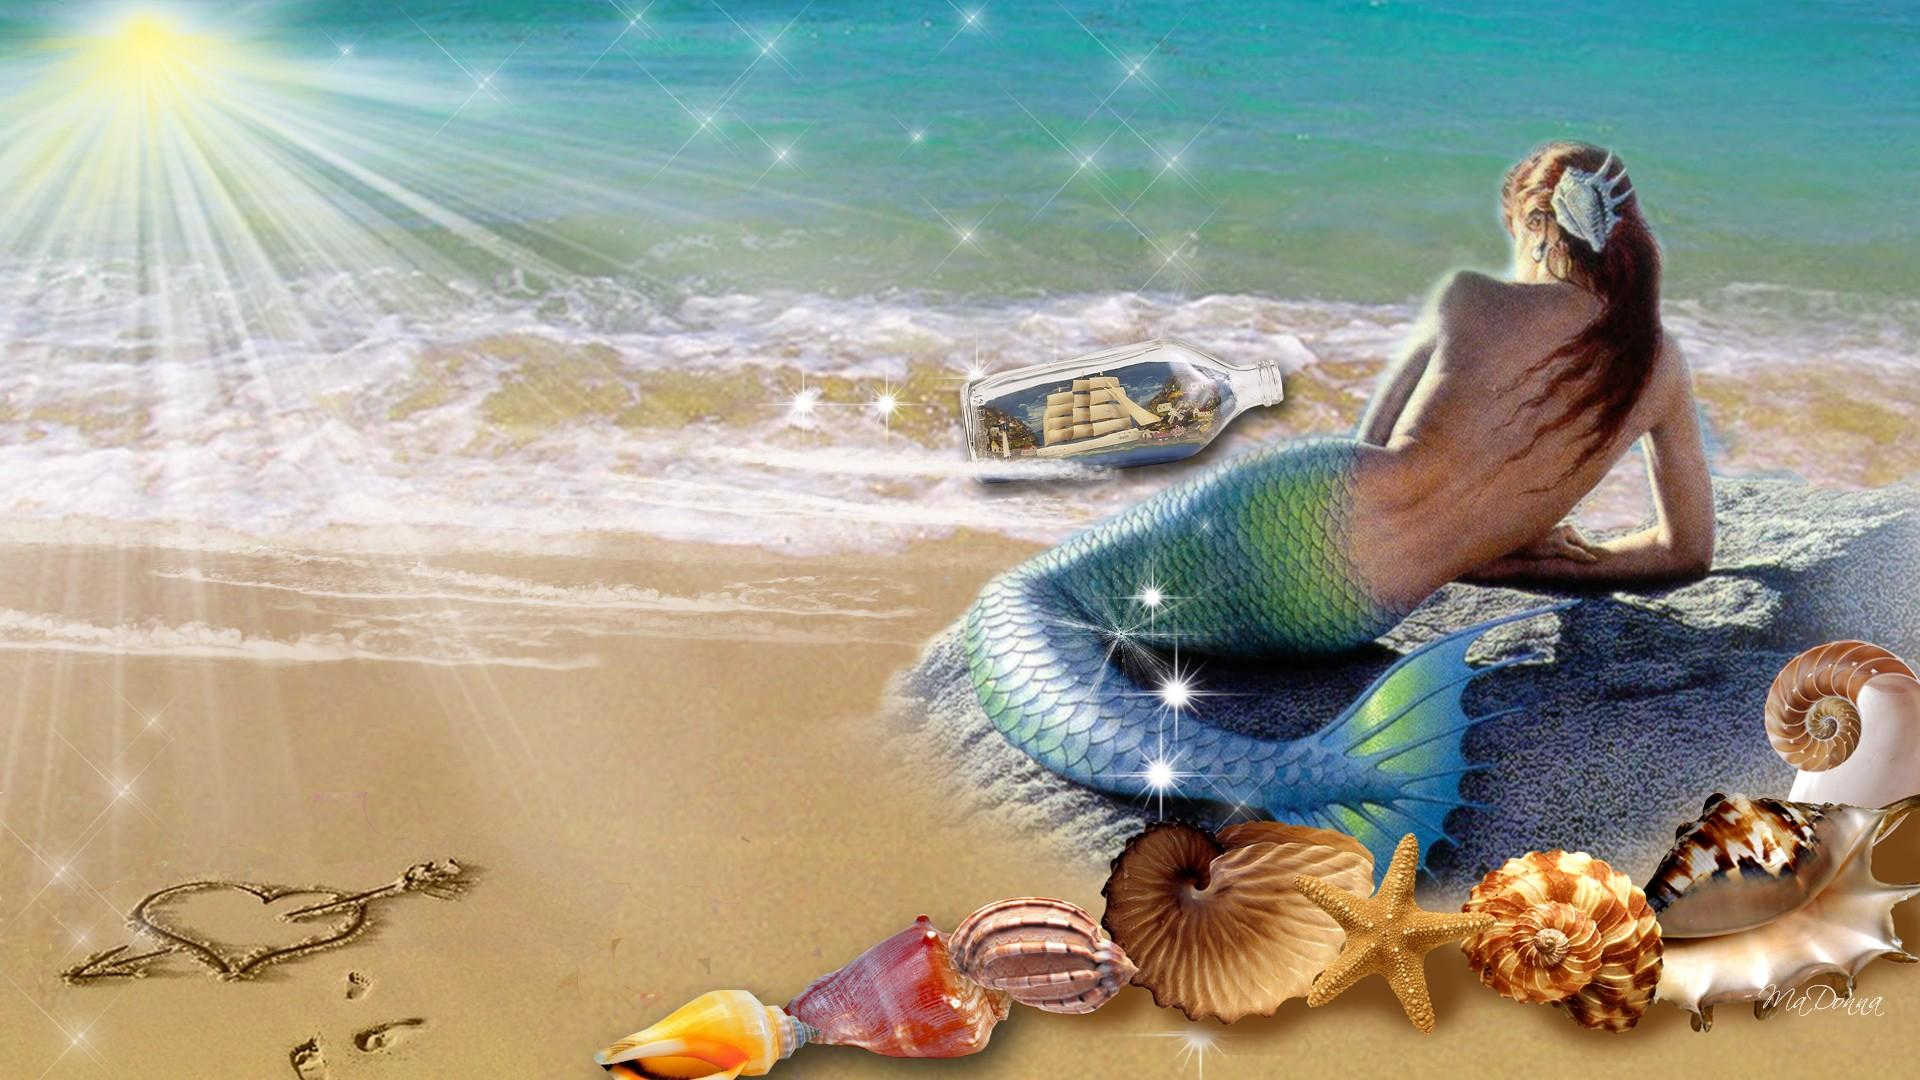 Permalink to Mermaid On The Beach Wallpaper